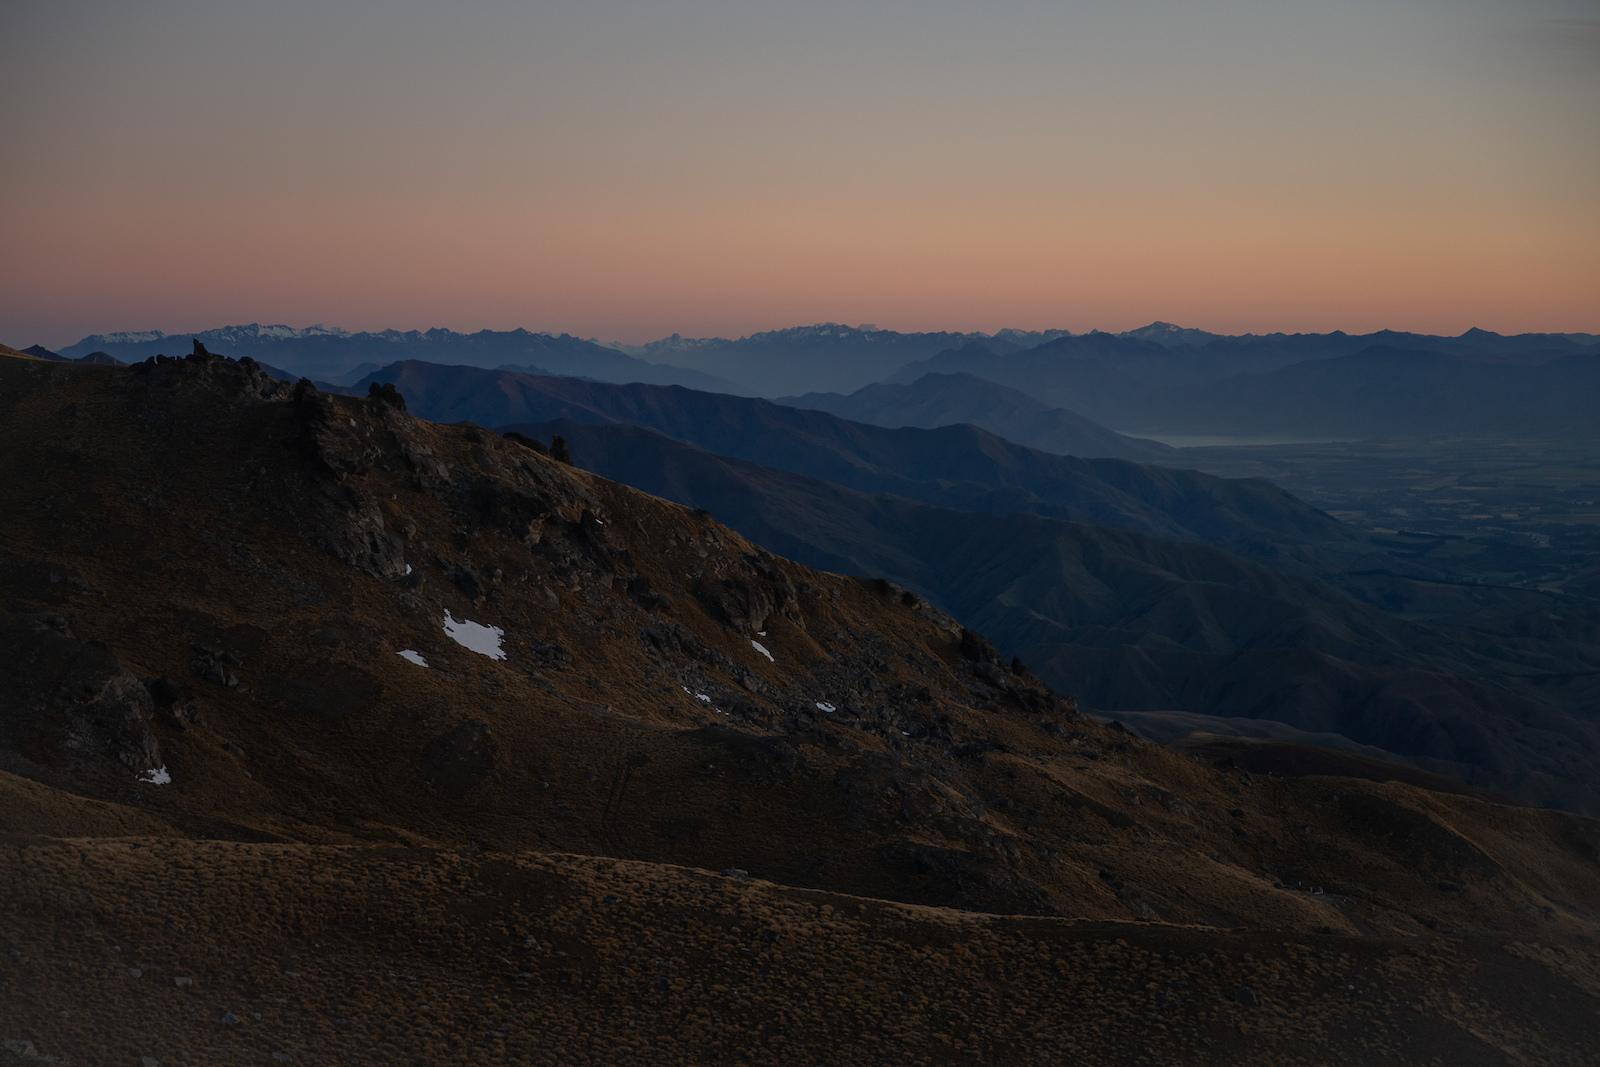 Beautiful layers looking towards Wanaka from the Cardrona resort.